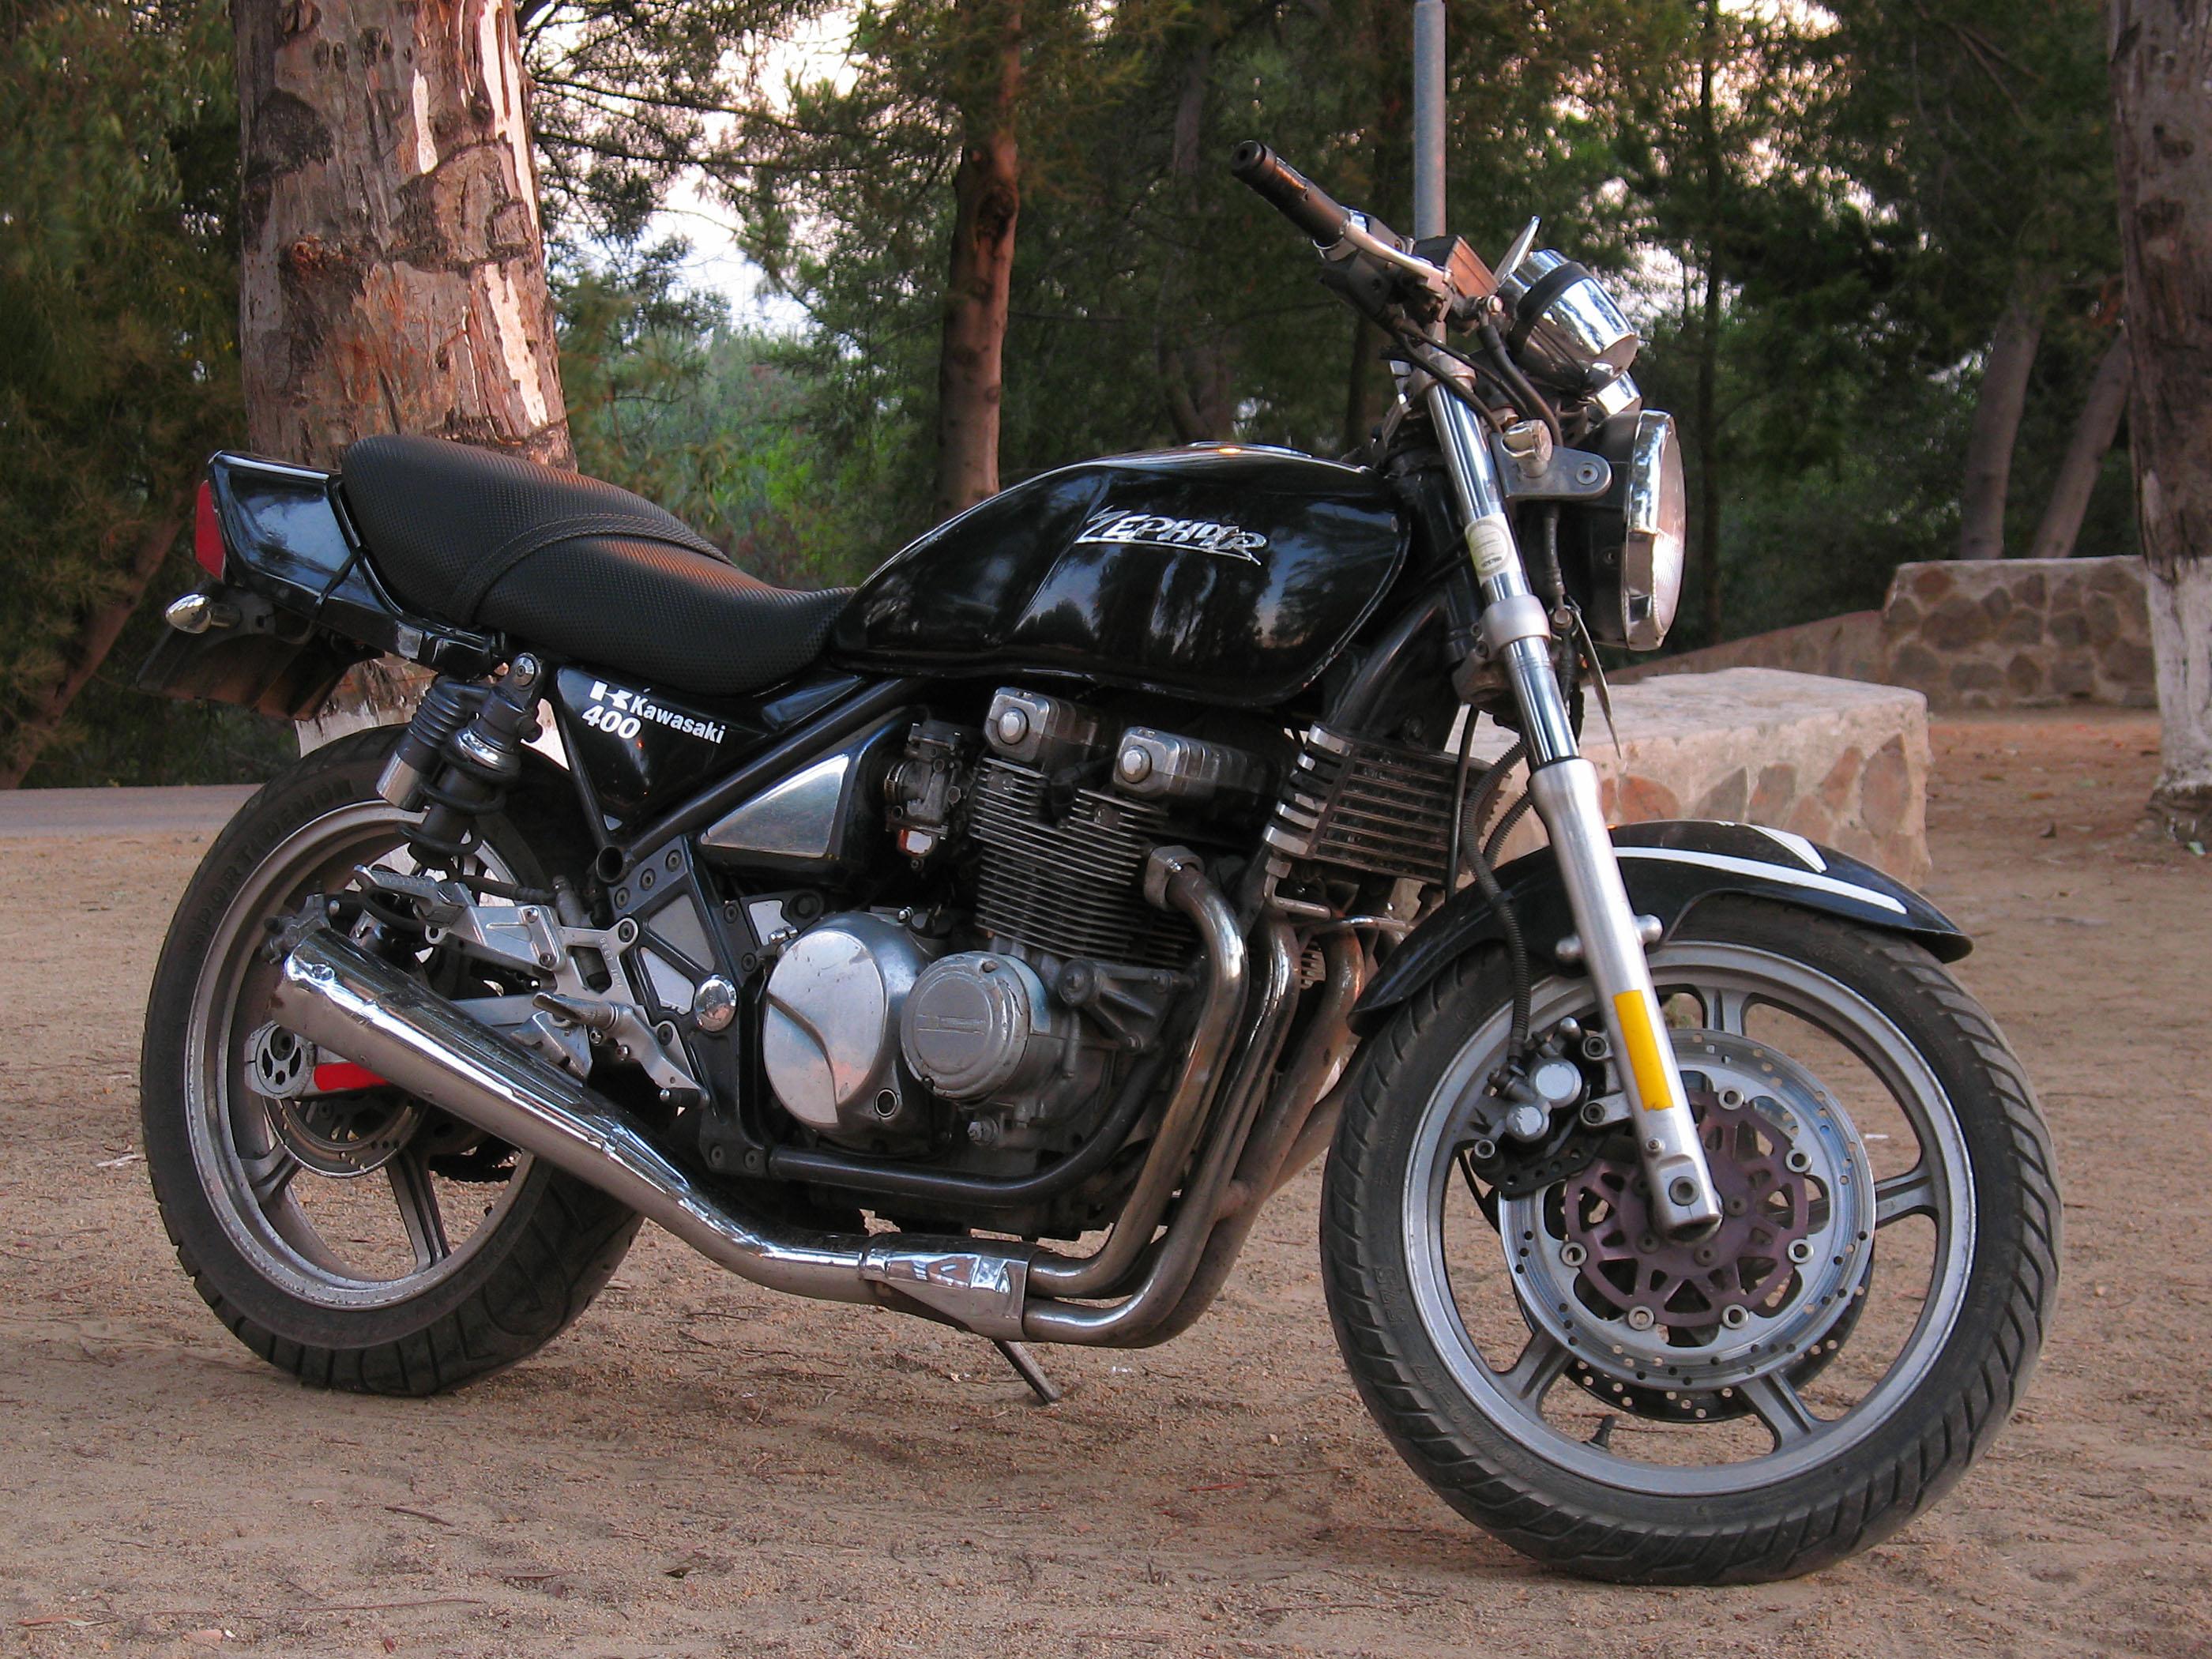 Kawasaki Zephyr For Sale On Ebay